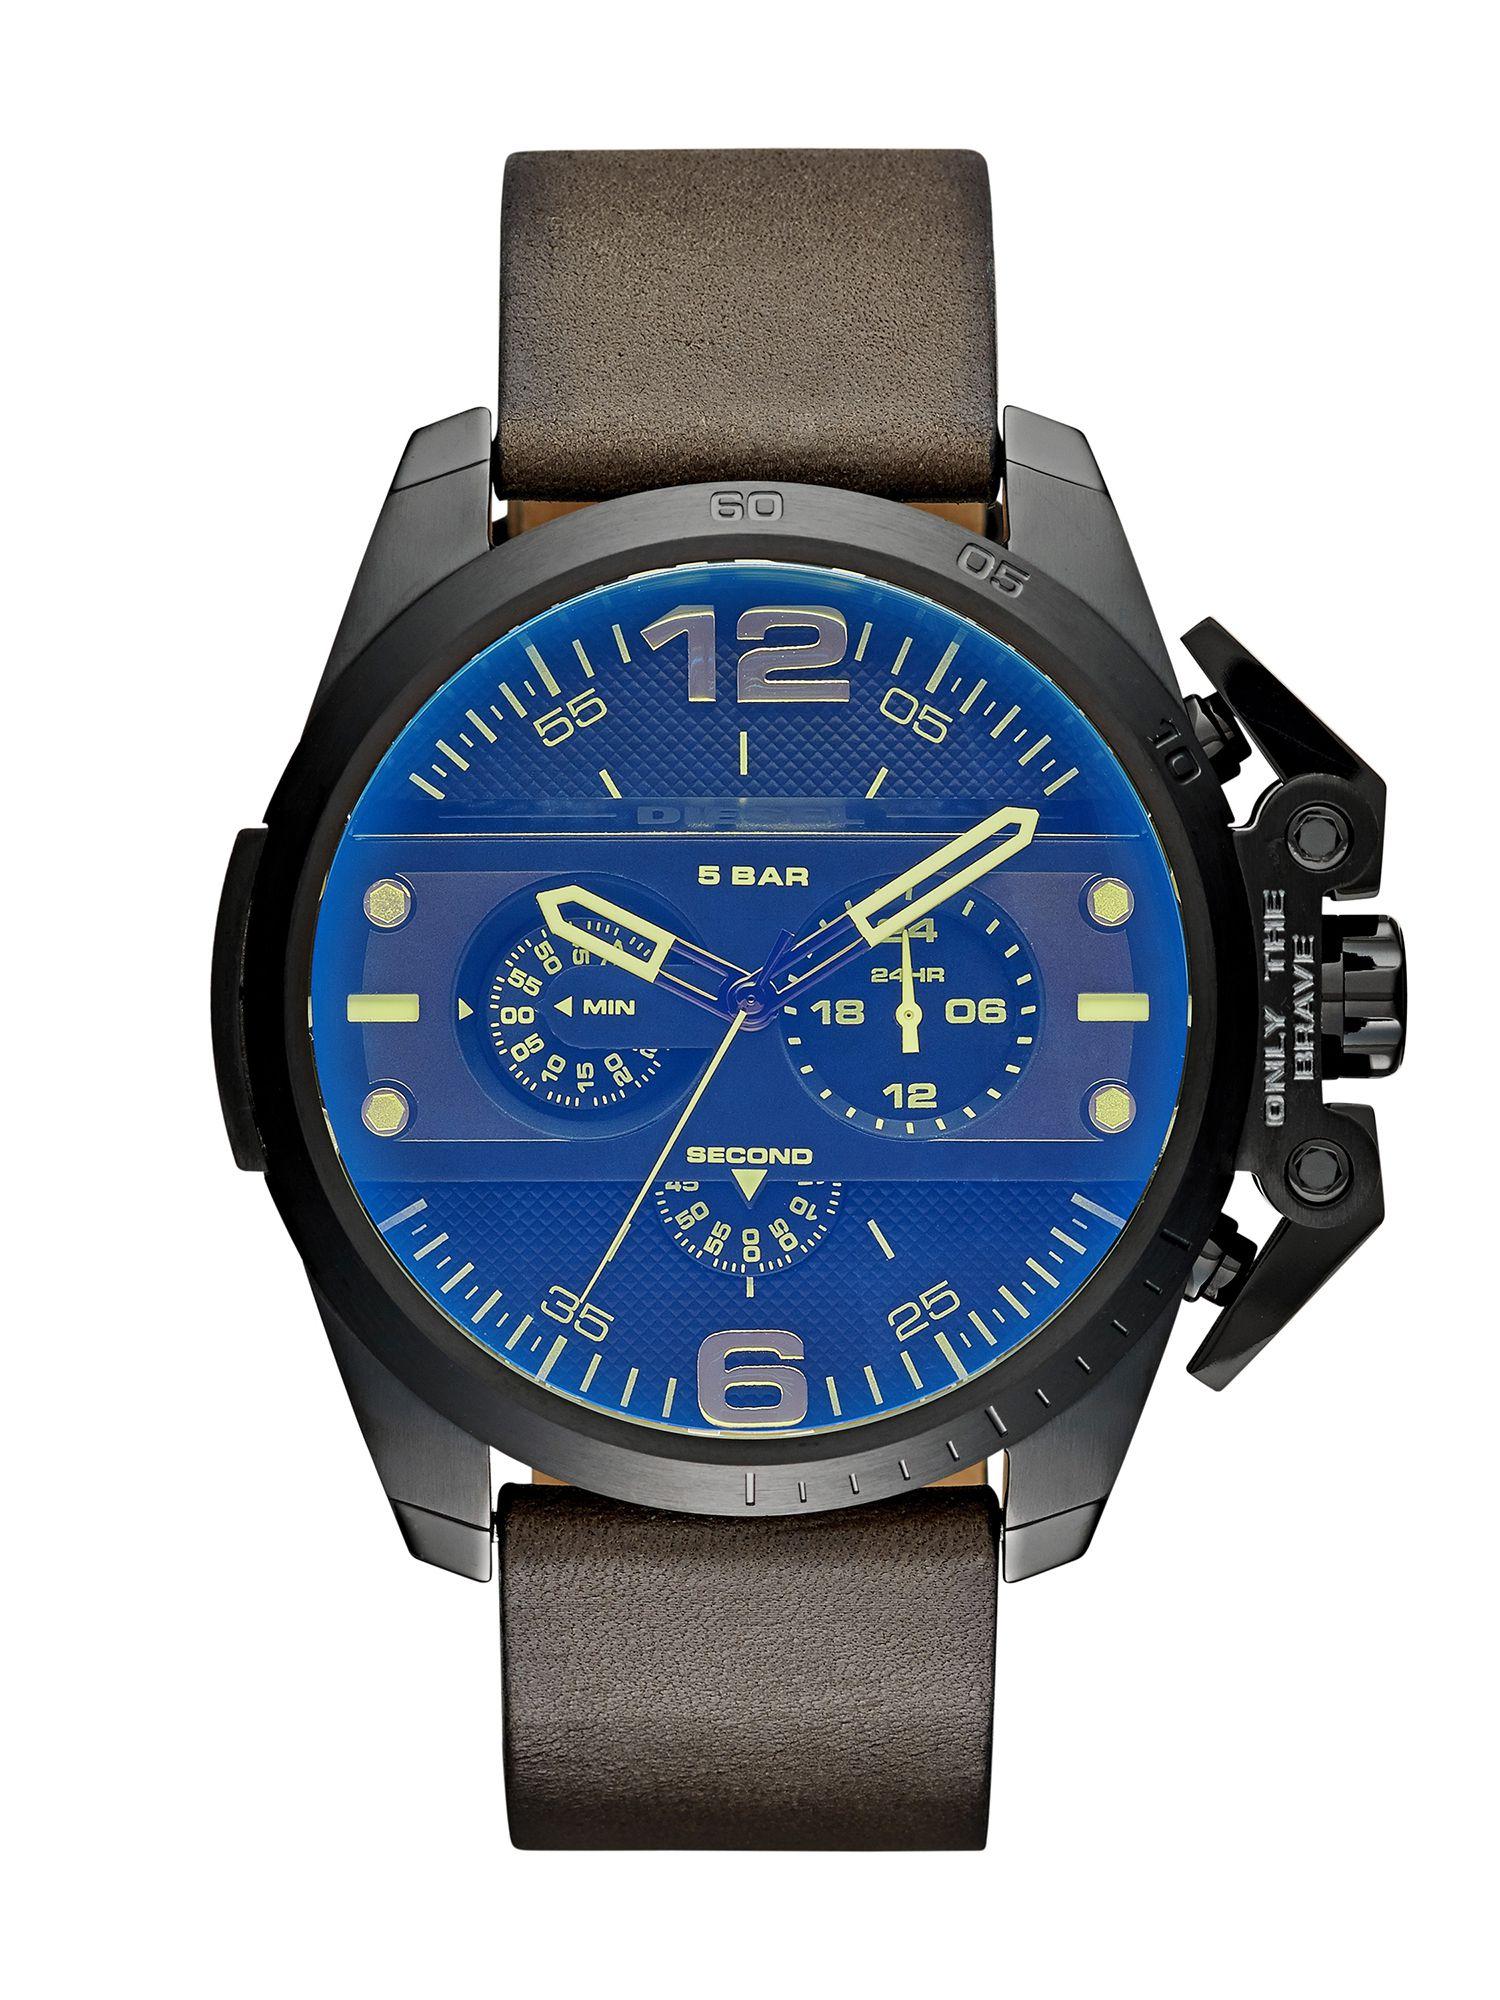 Pánske hodinky Diesel DZ4364 - Glami.sk d4d2ca26b47